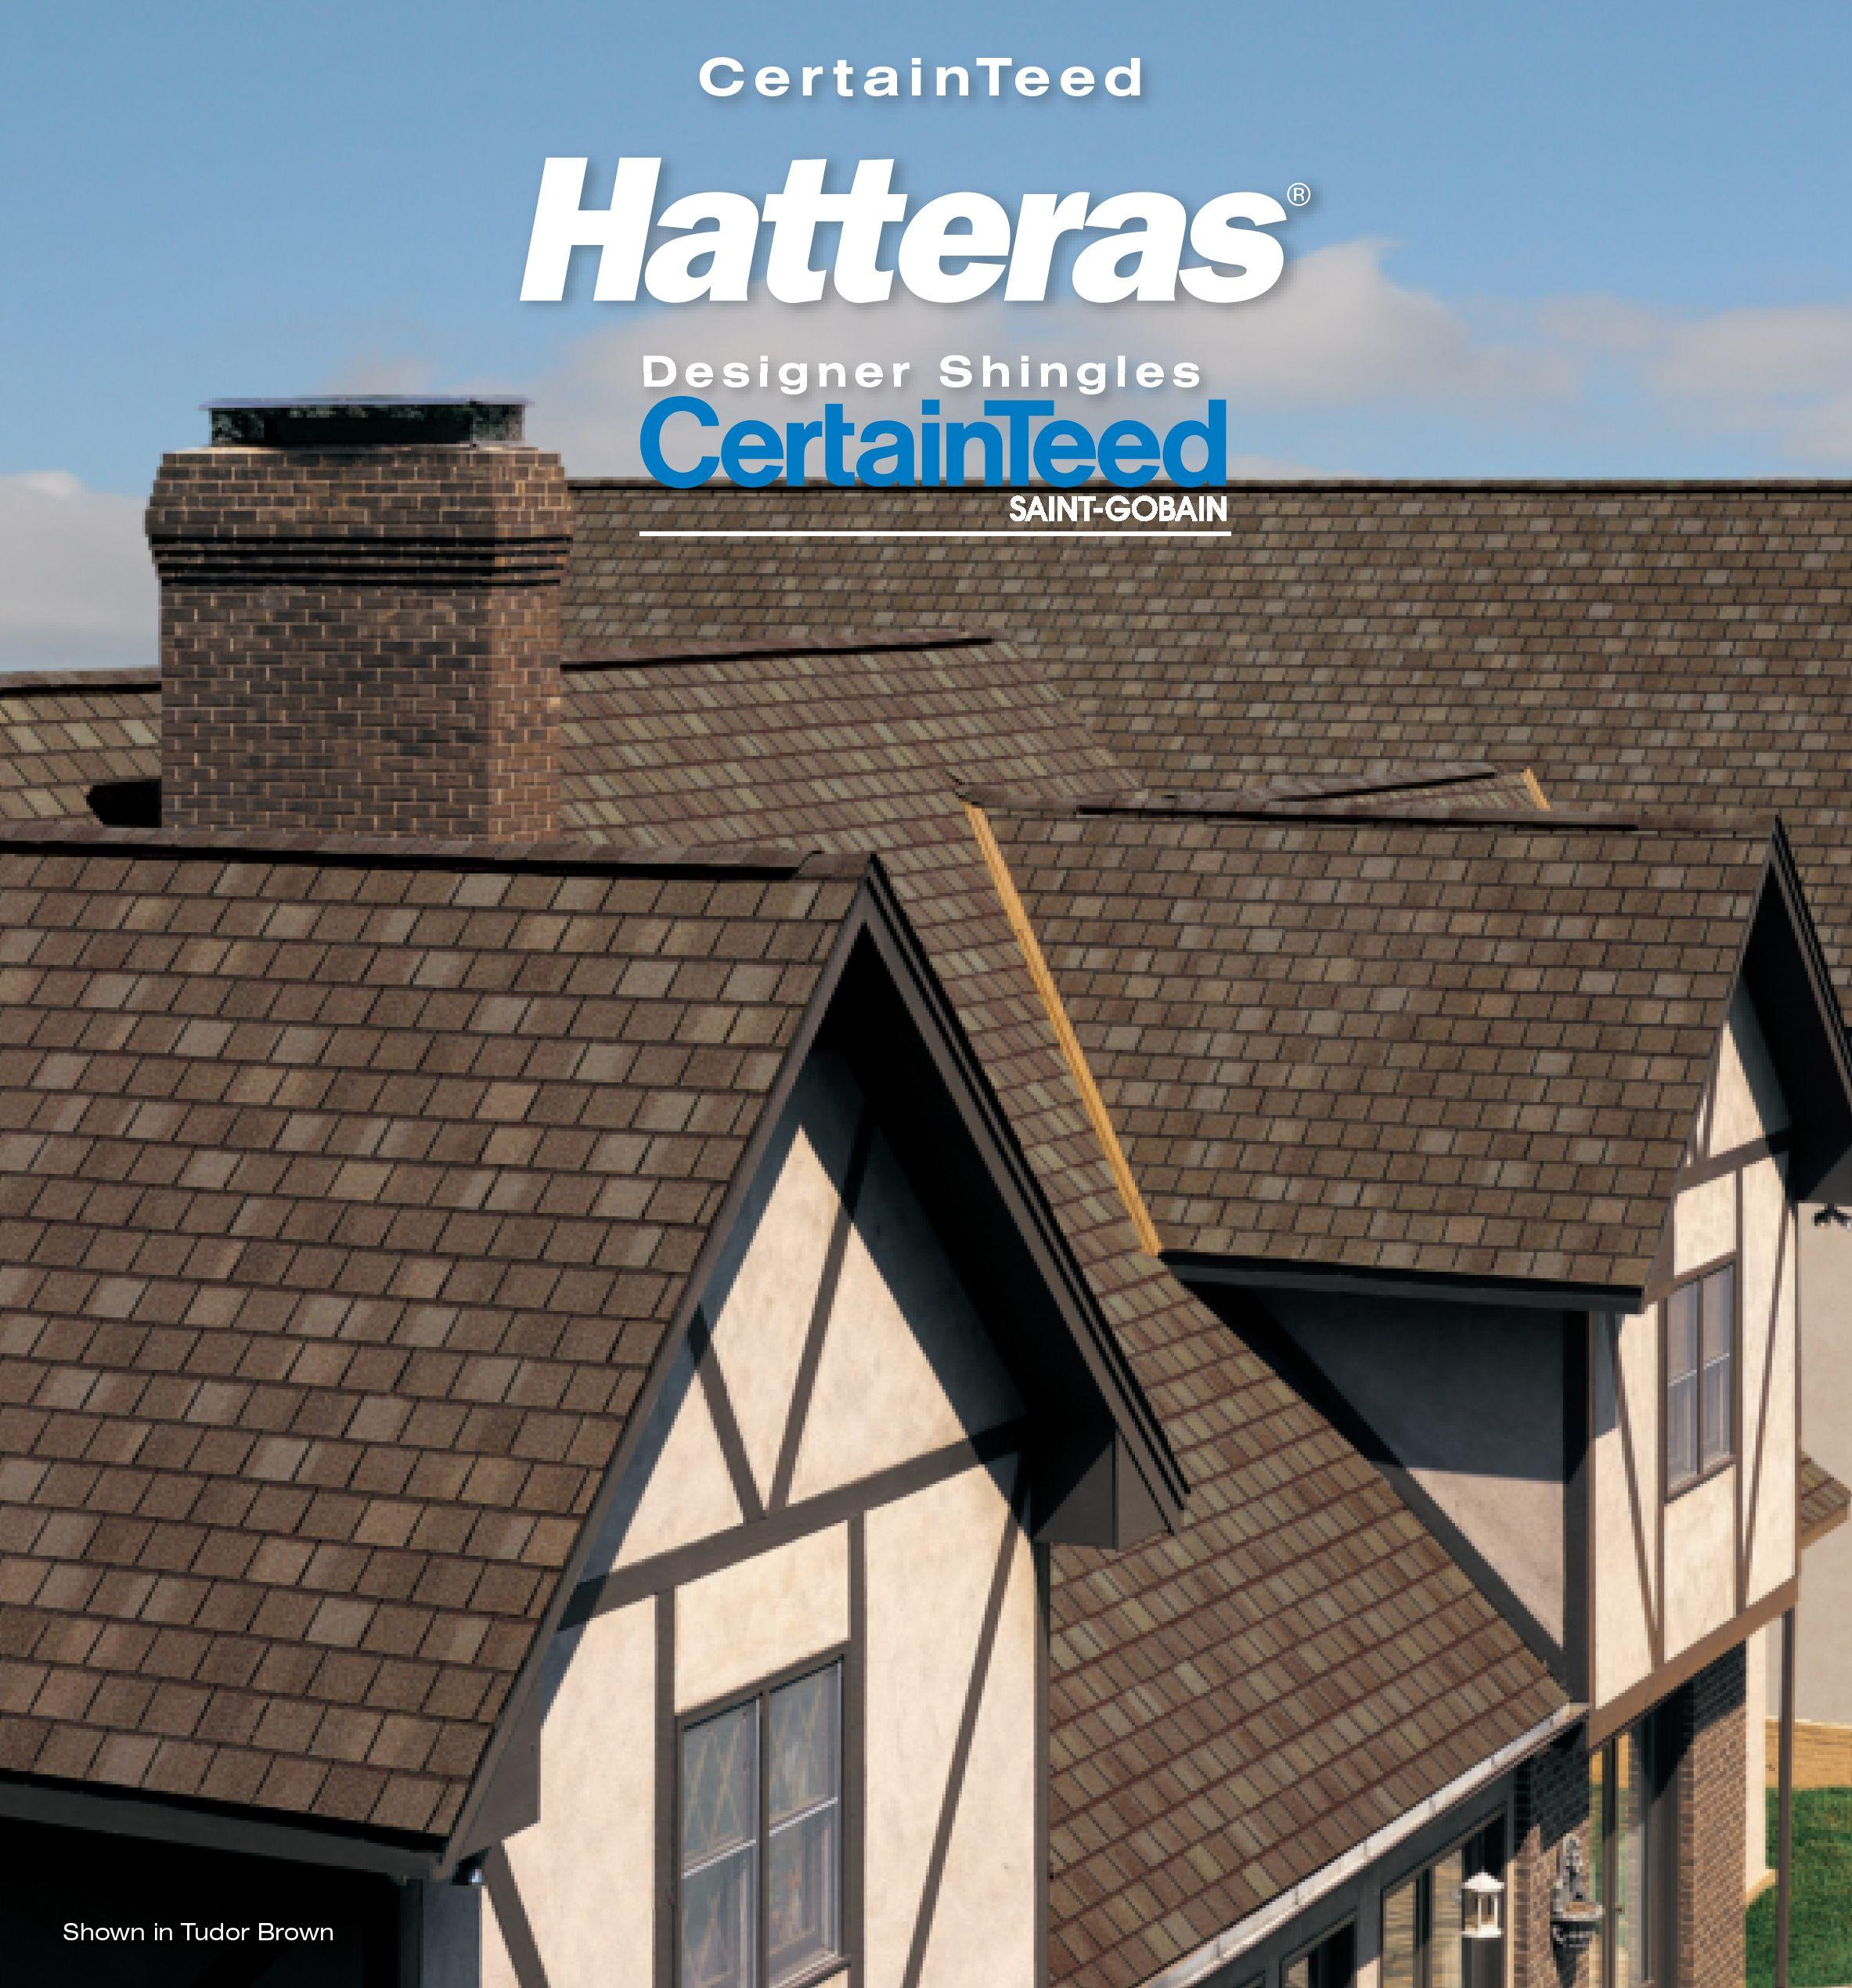 Best Certainteed Hatteras Certainteed Roofing Pinterest 400 x 300